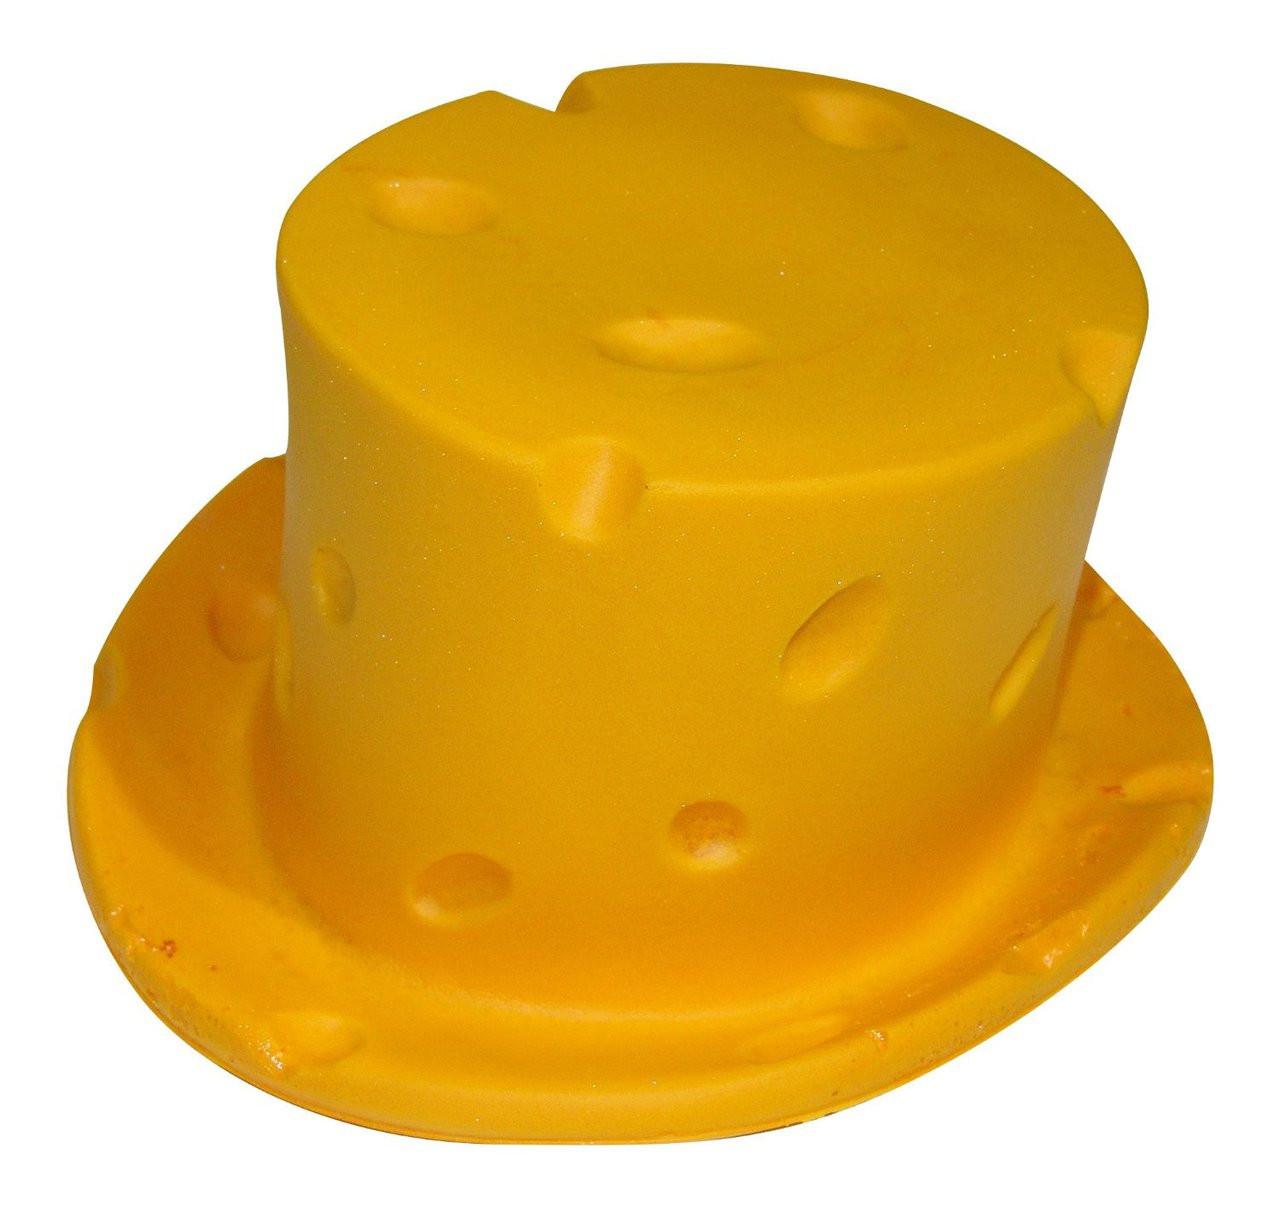 b3b6b871 Green Bay Packers NFL Cheesehead Top Hat